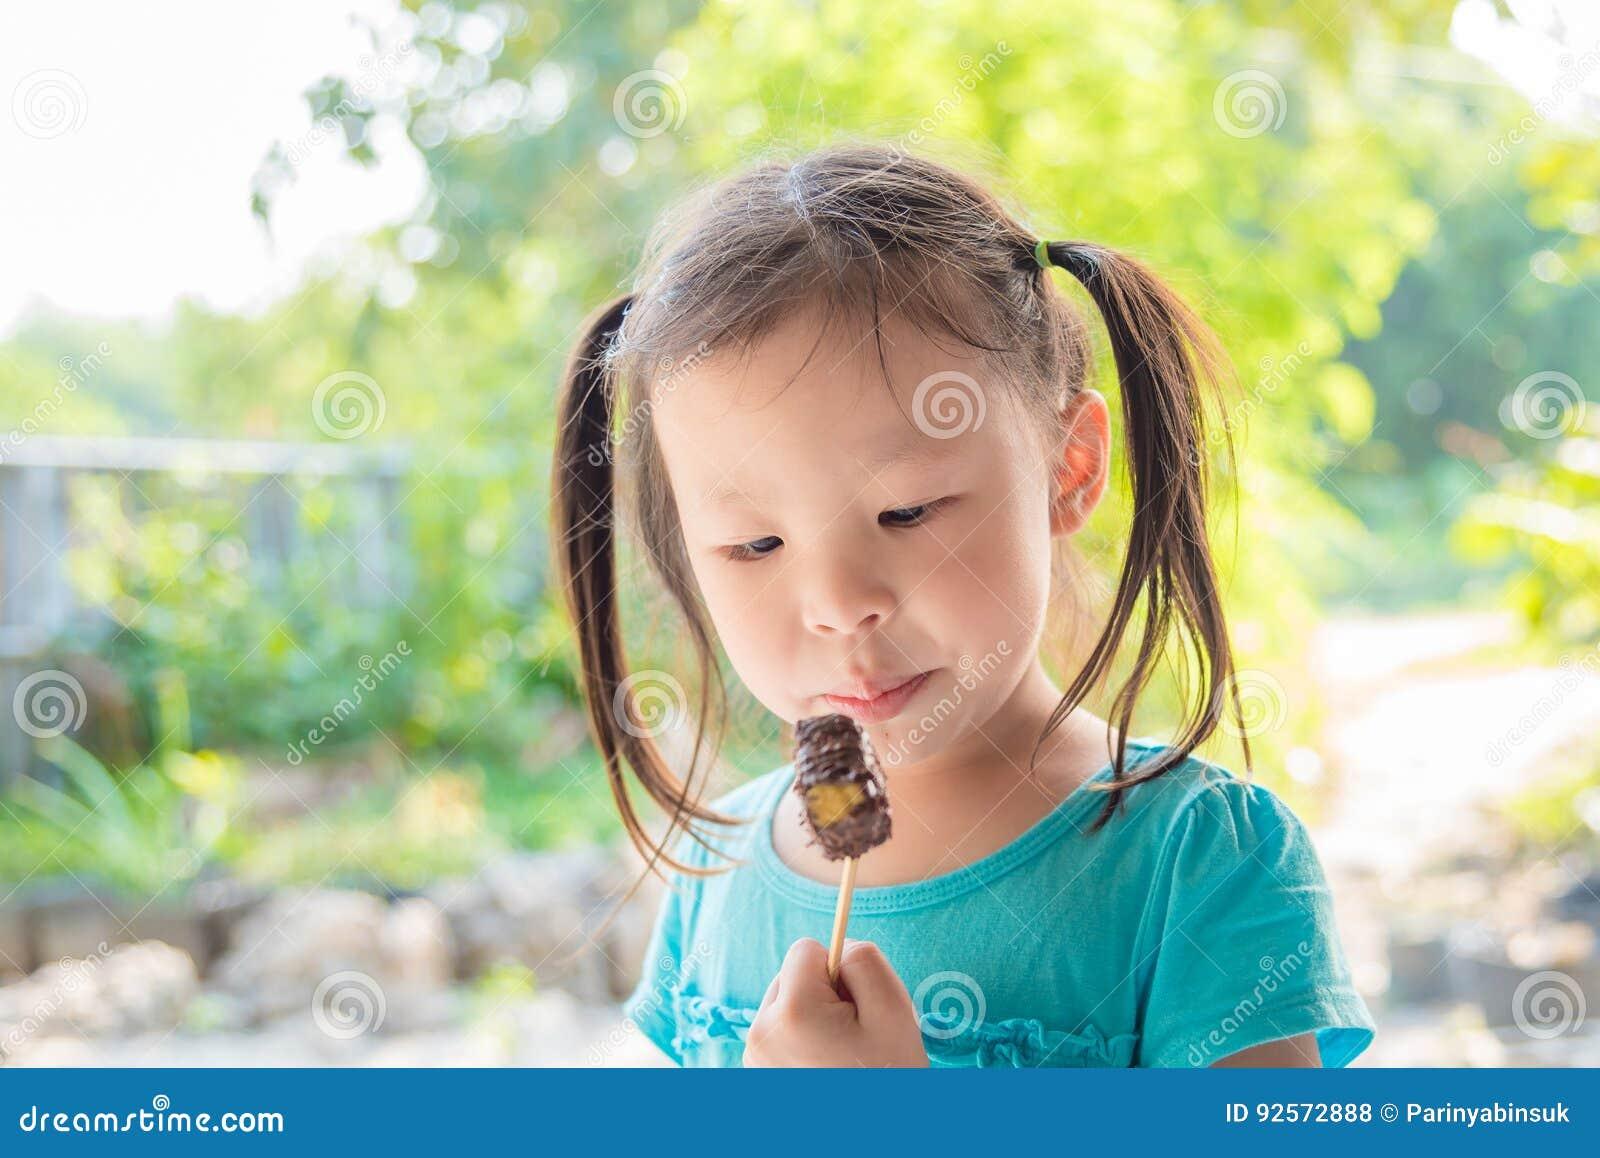 Bambina che mangia cioccolato